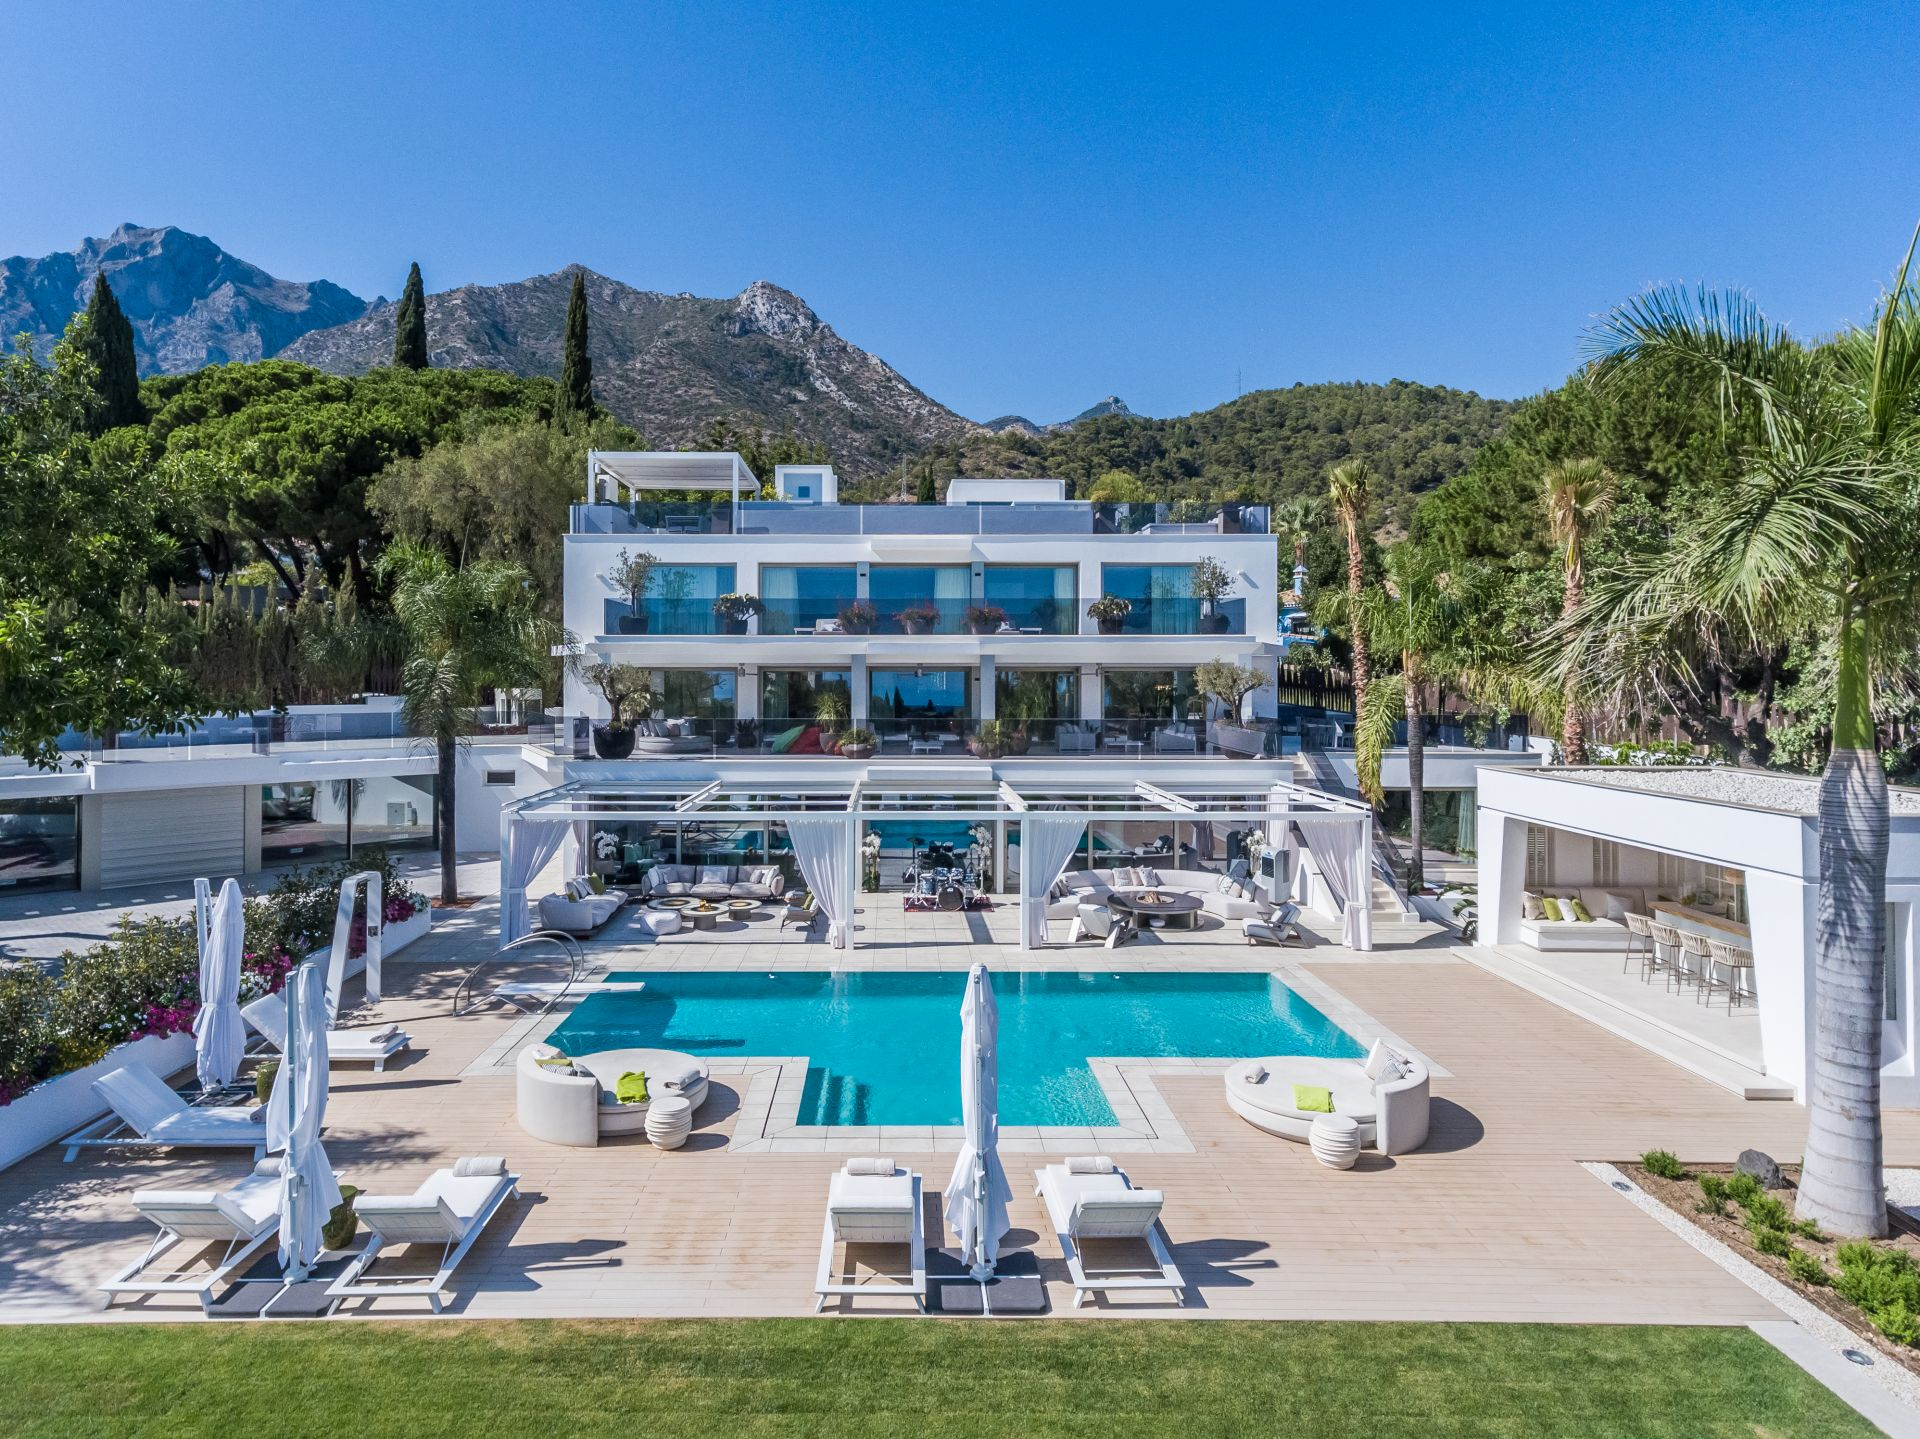 LUXURY MODERN VILLA IN CASCADA DE CAMOJAN, MARBELLA | Christie's International Real Estate